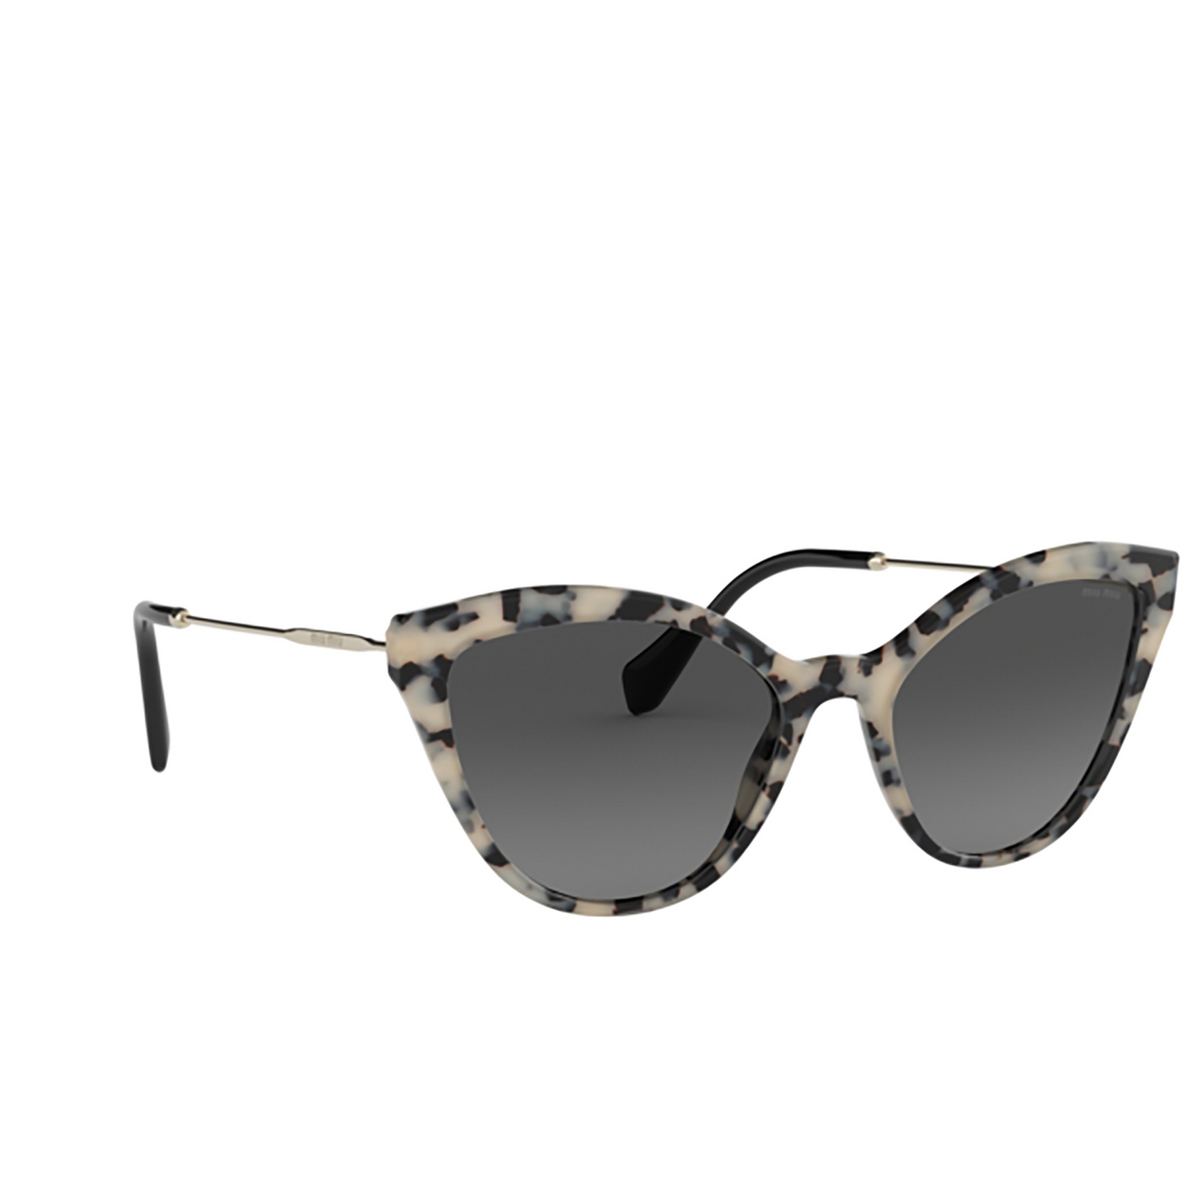 Miu Miu® Cat-eye Sunglasses: MU 03US color Sand Havana Brown KAD3M1.